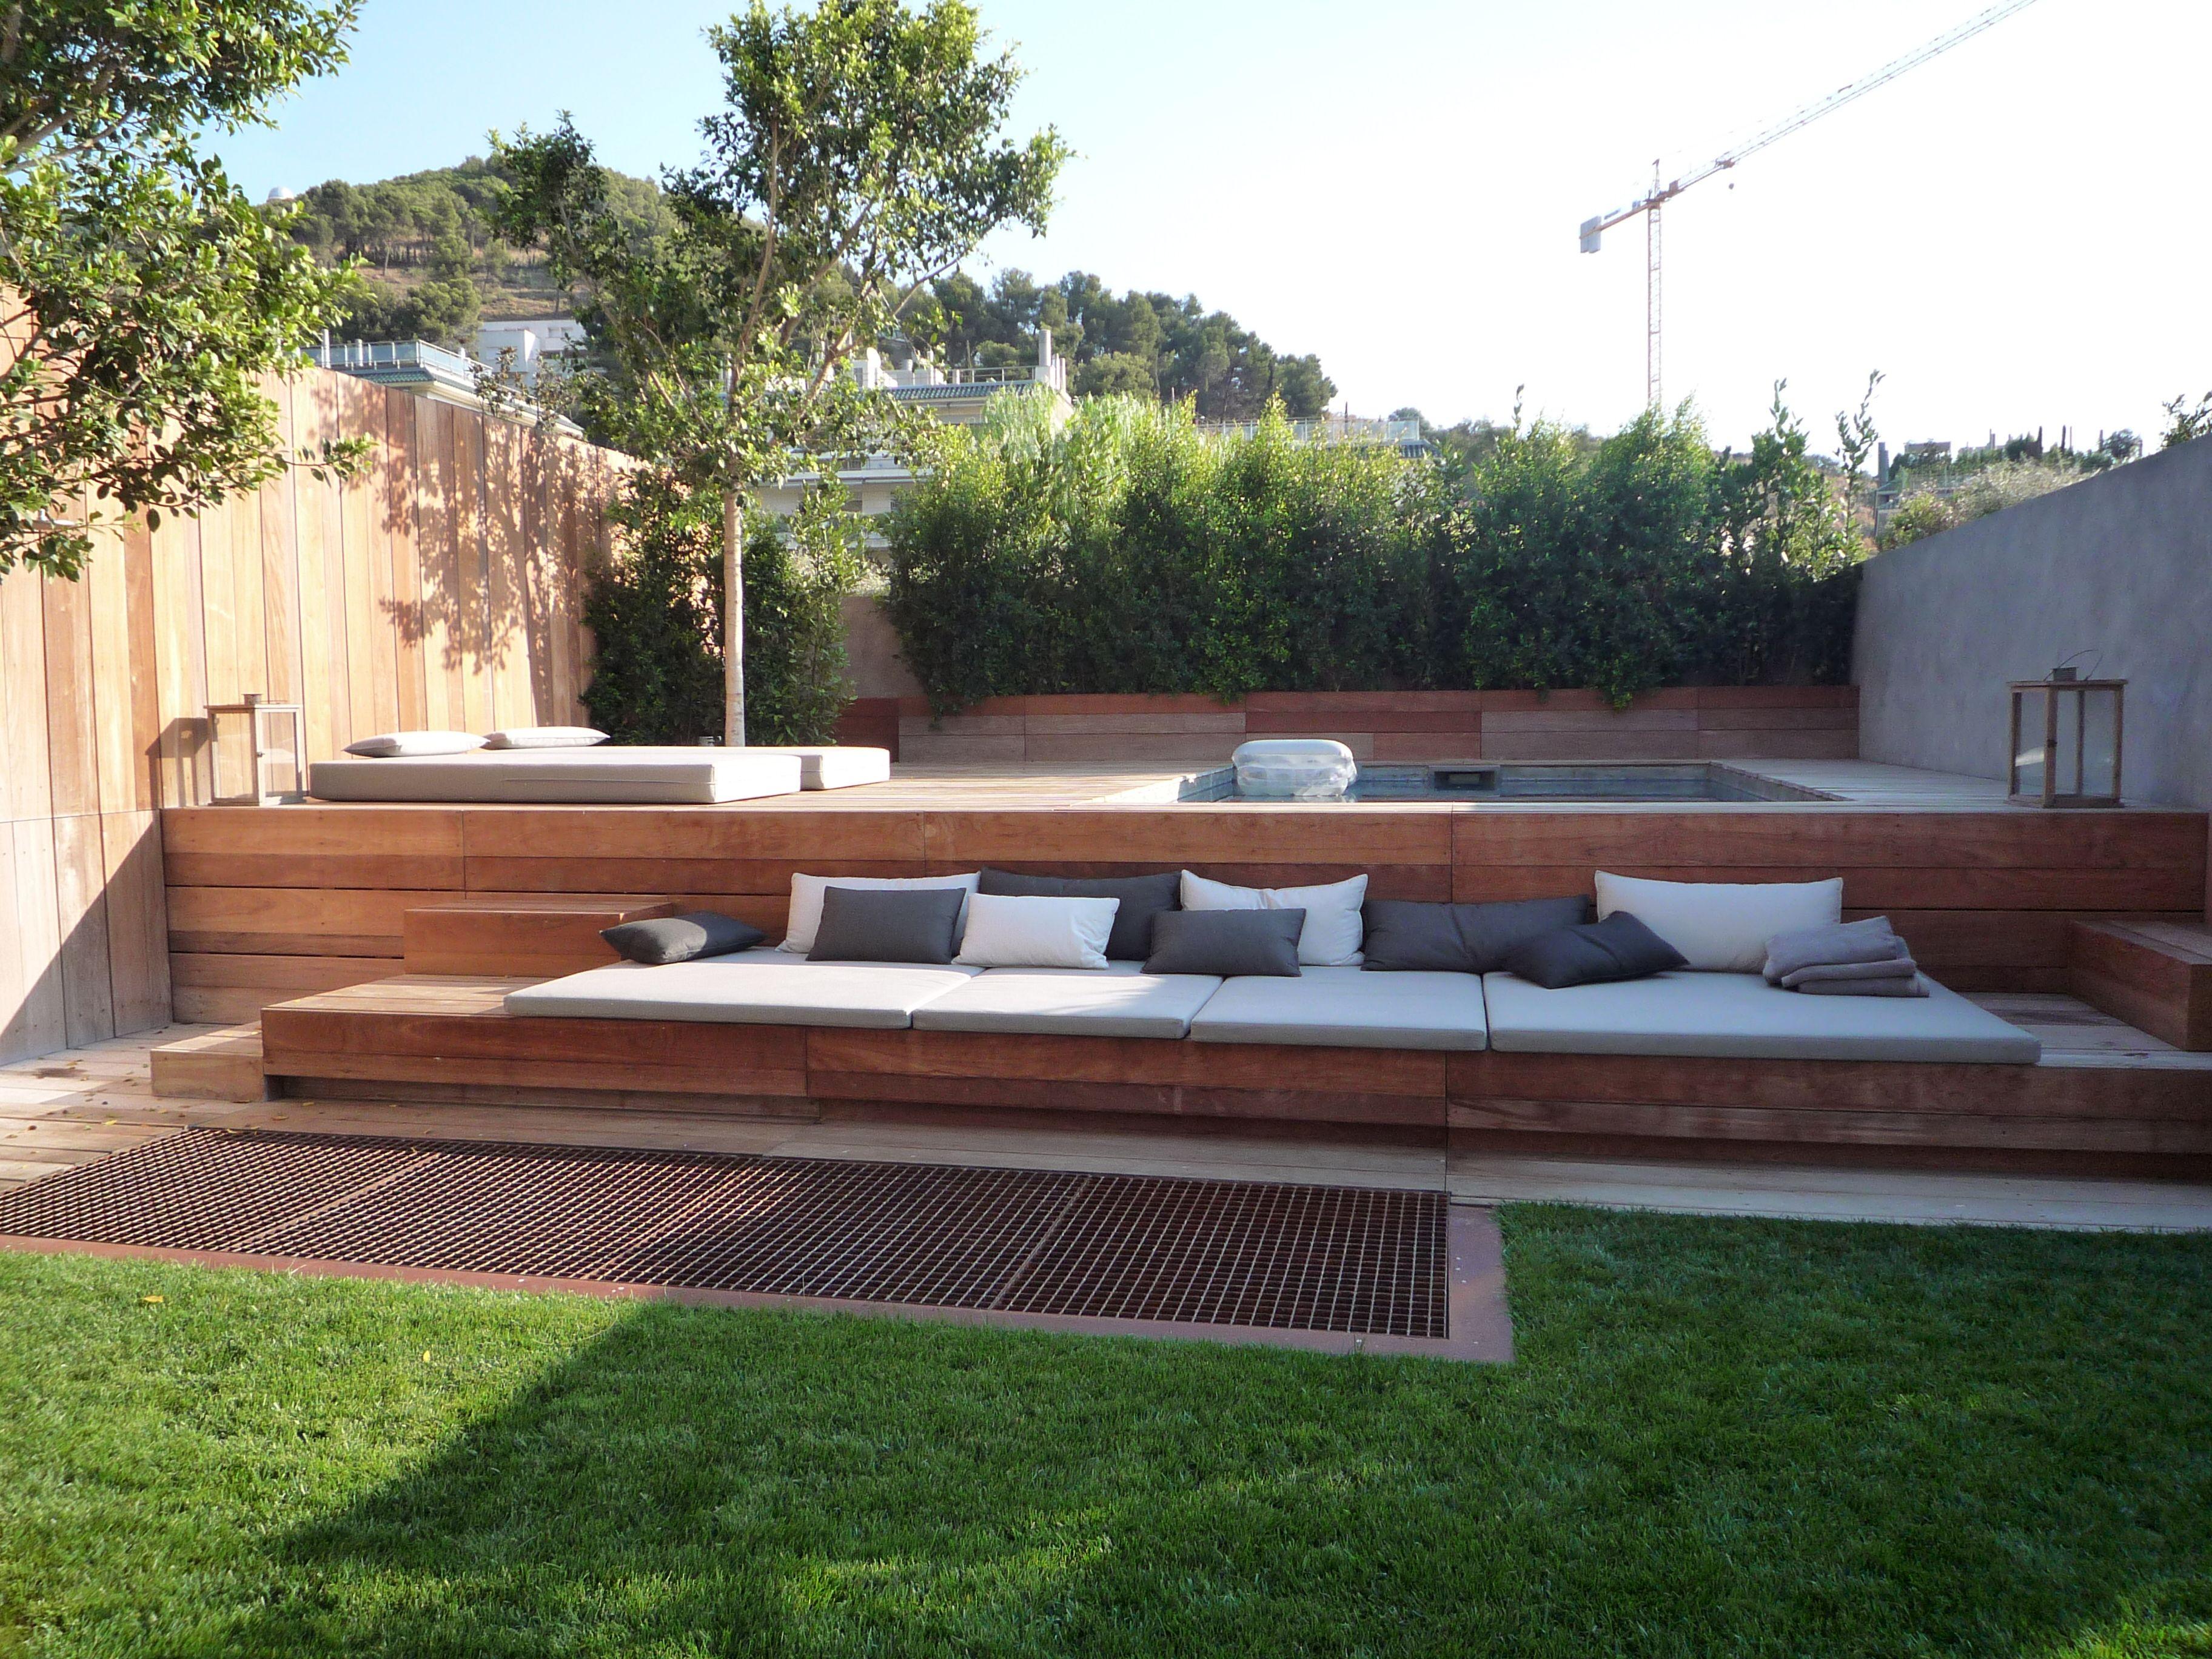 Piscine Hors Sol Portugal jorge rodriguez-martin   piscine et jardin, piscine hors sol